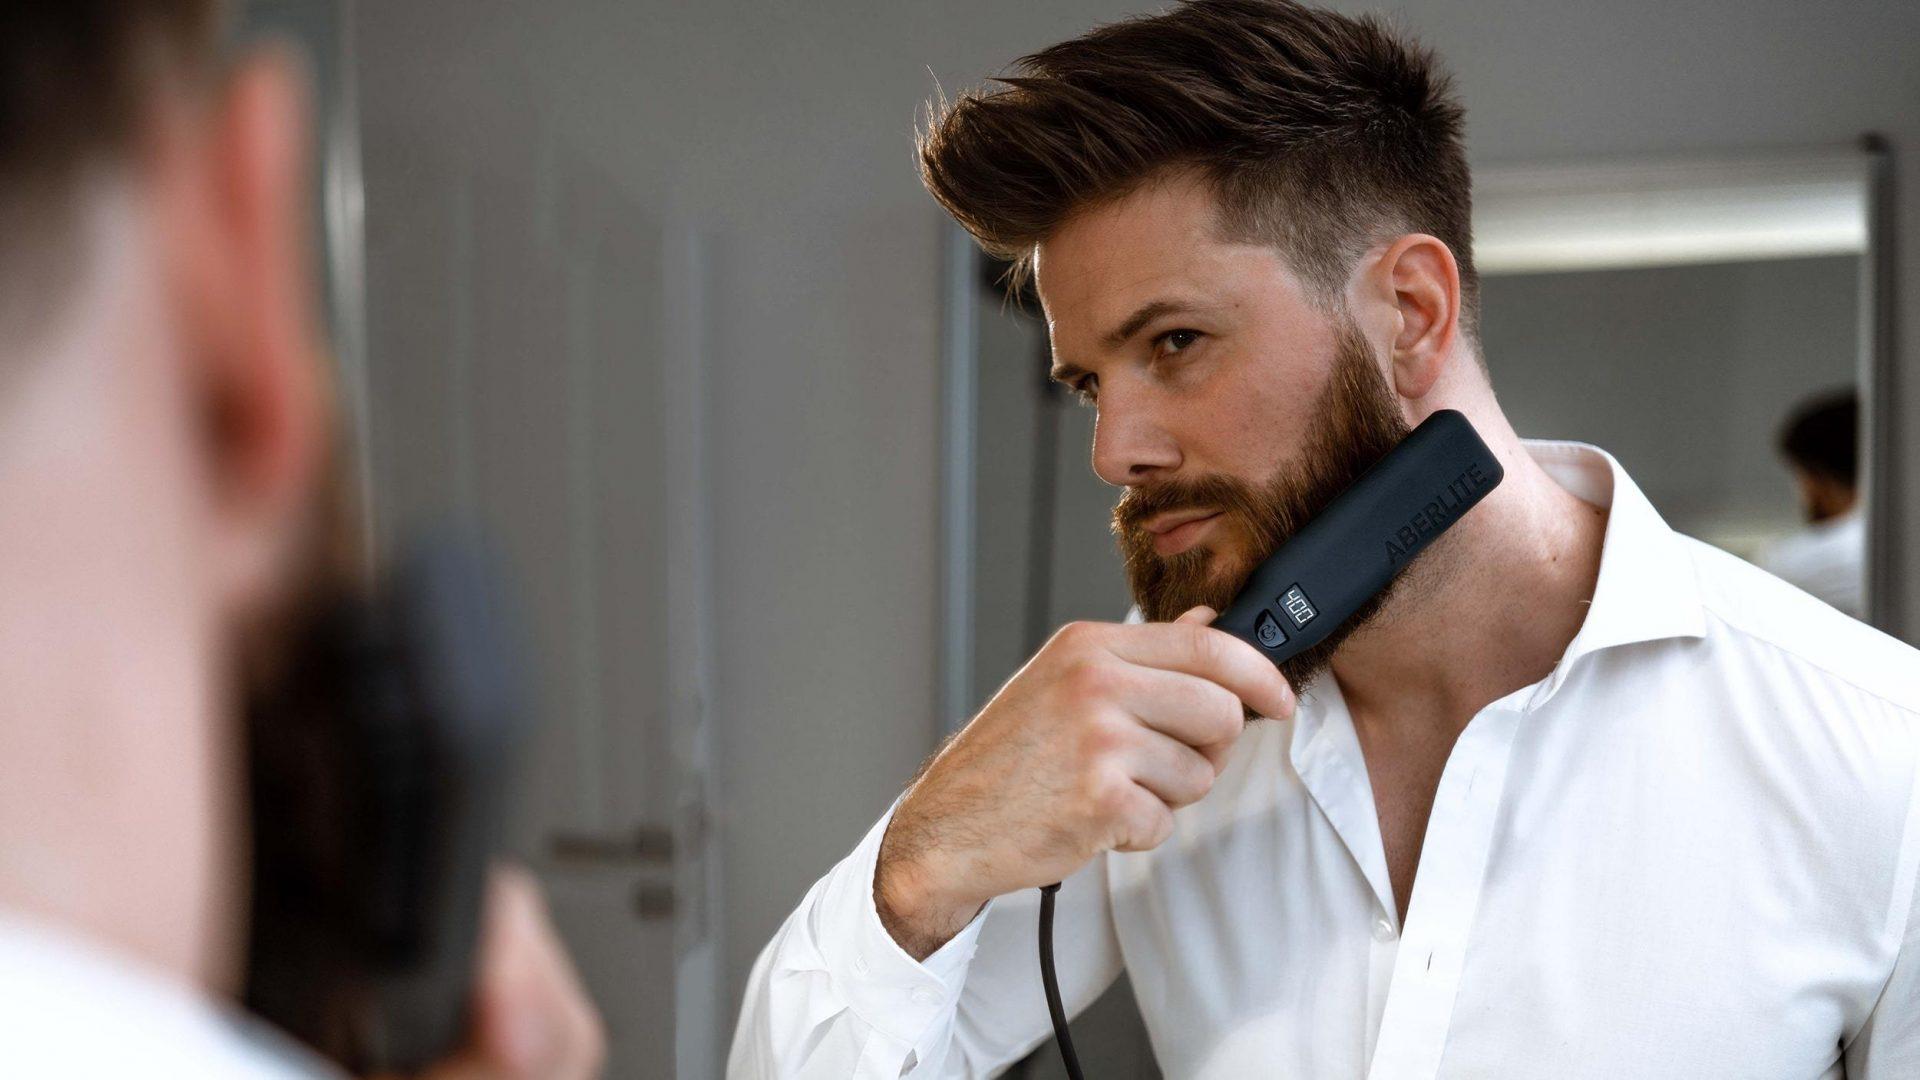 Aberlite Pro Beard Straightener